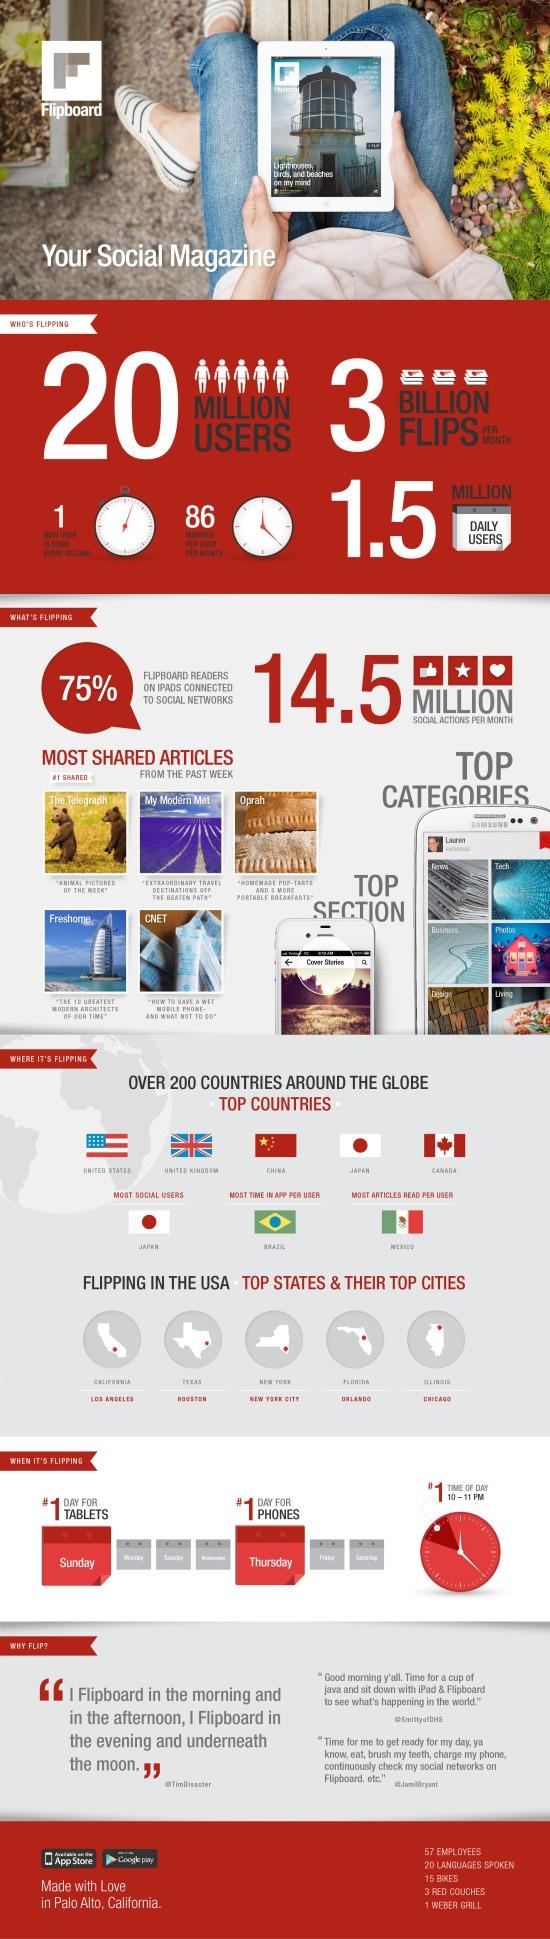 Flipboard Infographic by benbreckler